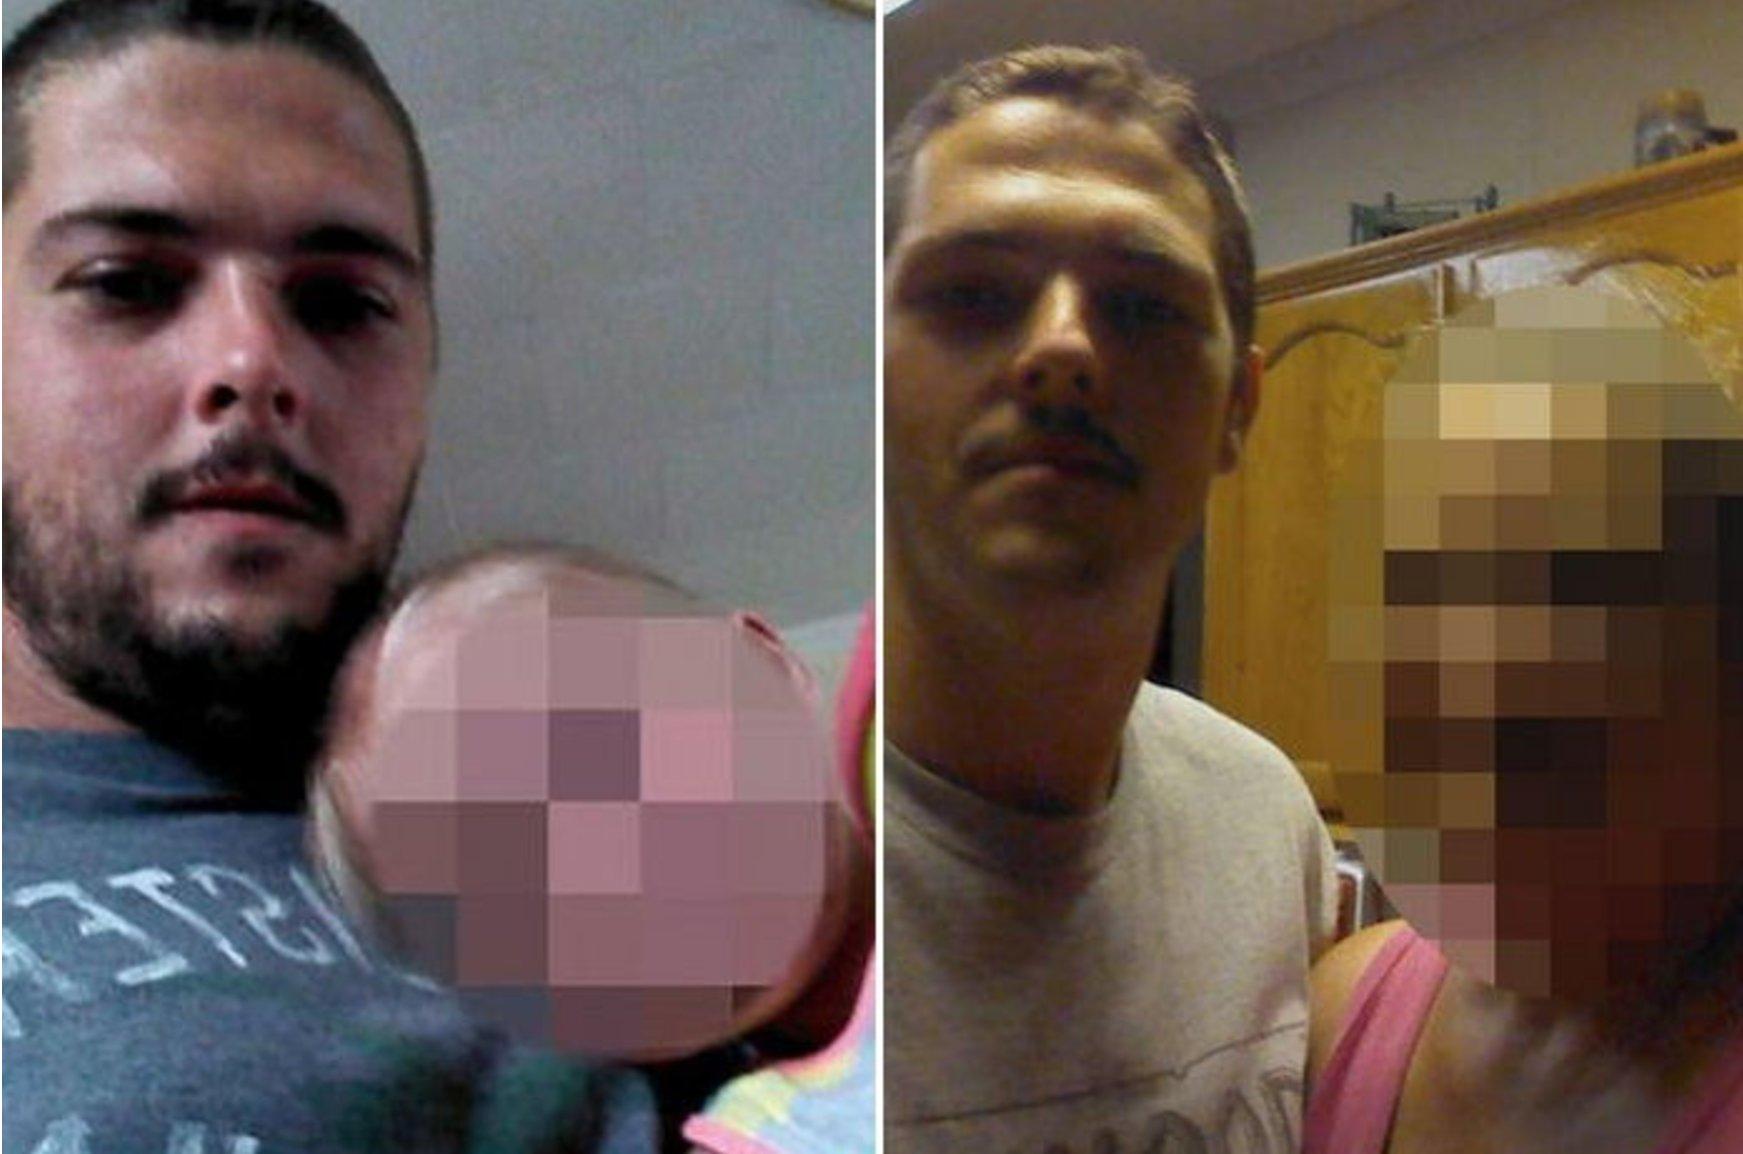 ec84b1ed8faded9689 - 엄마의 남자친구에게 '성폭행'당해 피범벅이 된 '7살' 소녀